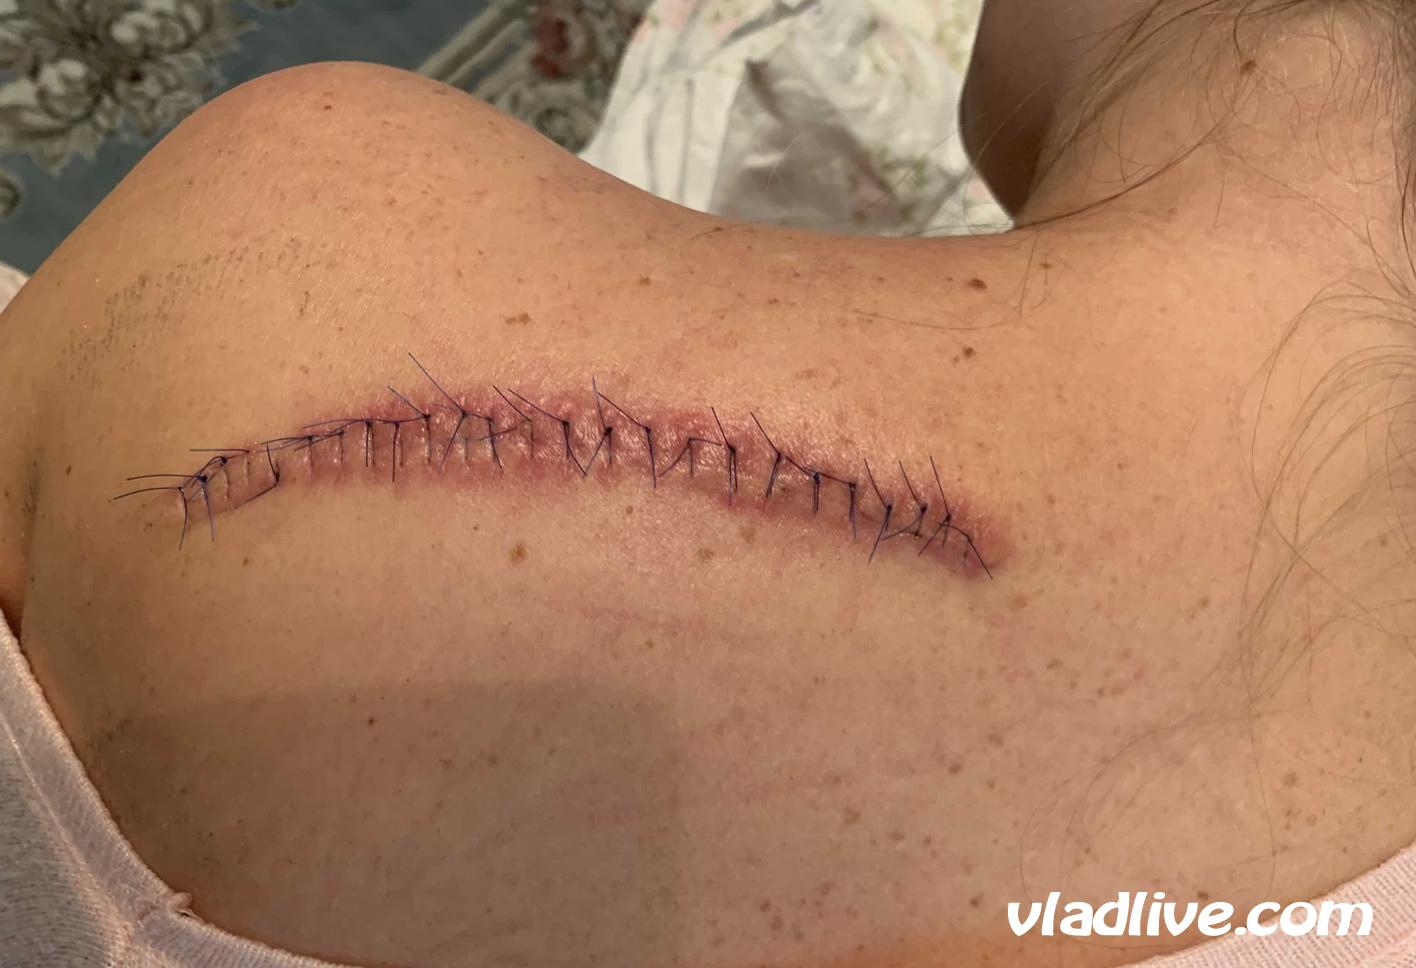 Меланома. Операция в Израиле